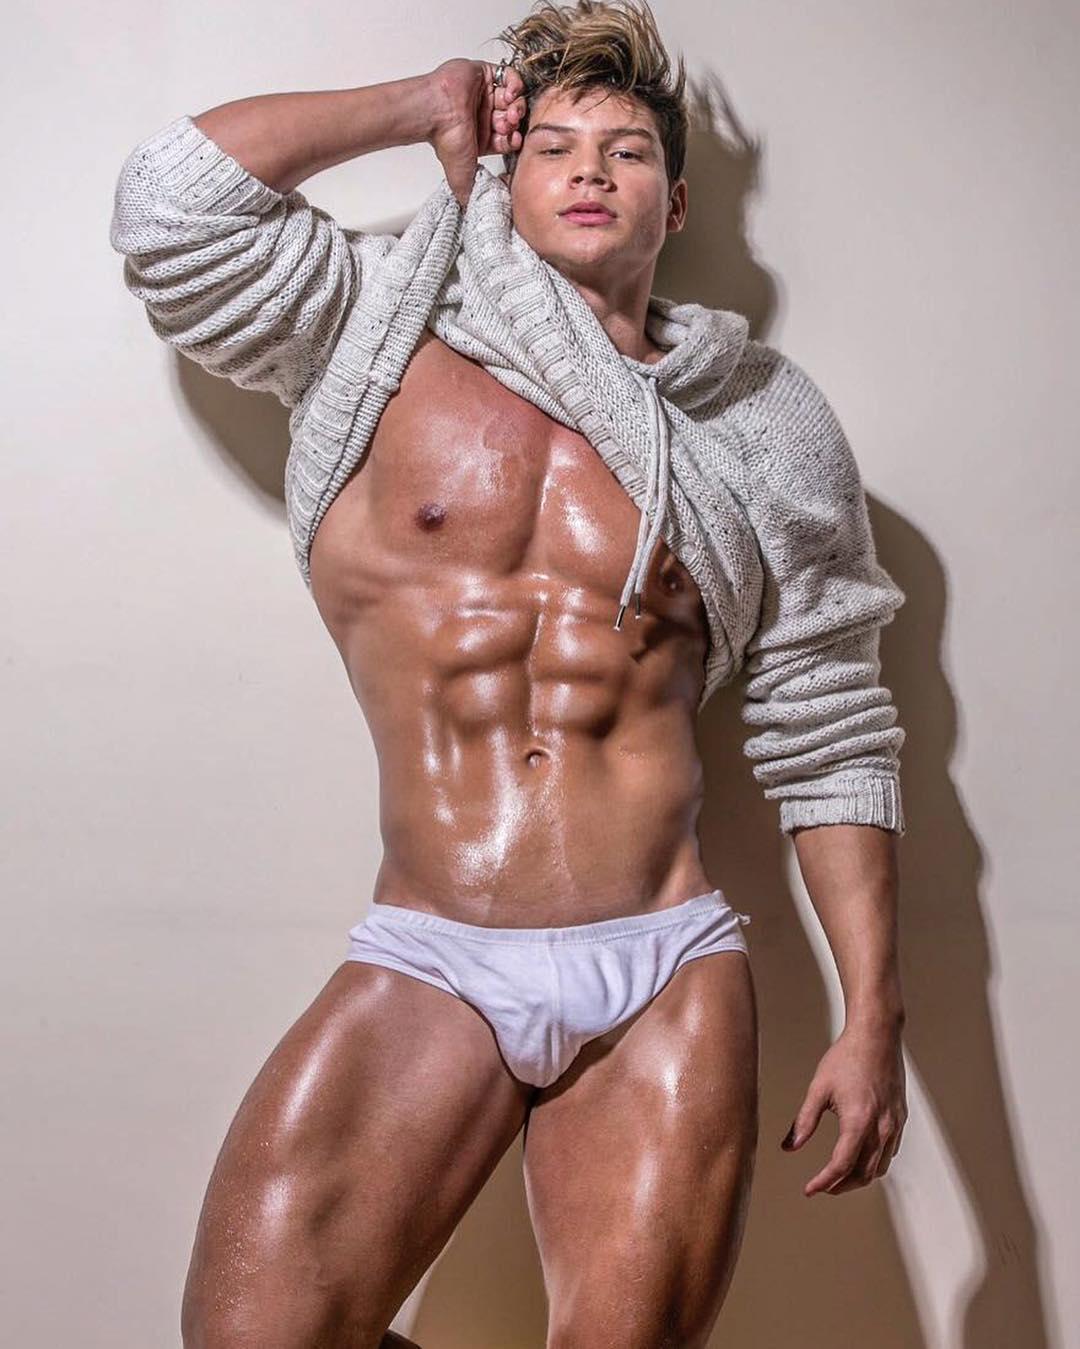 Luis Domingo Baez by Daniel Alonso